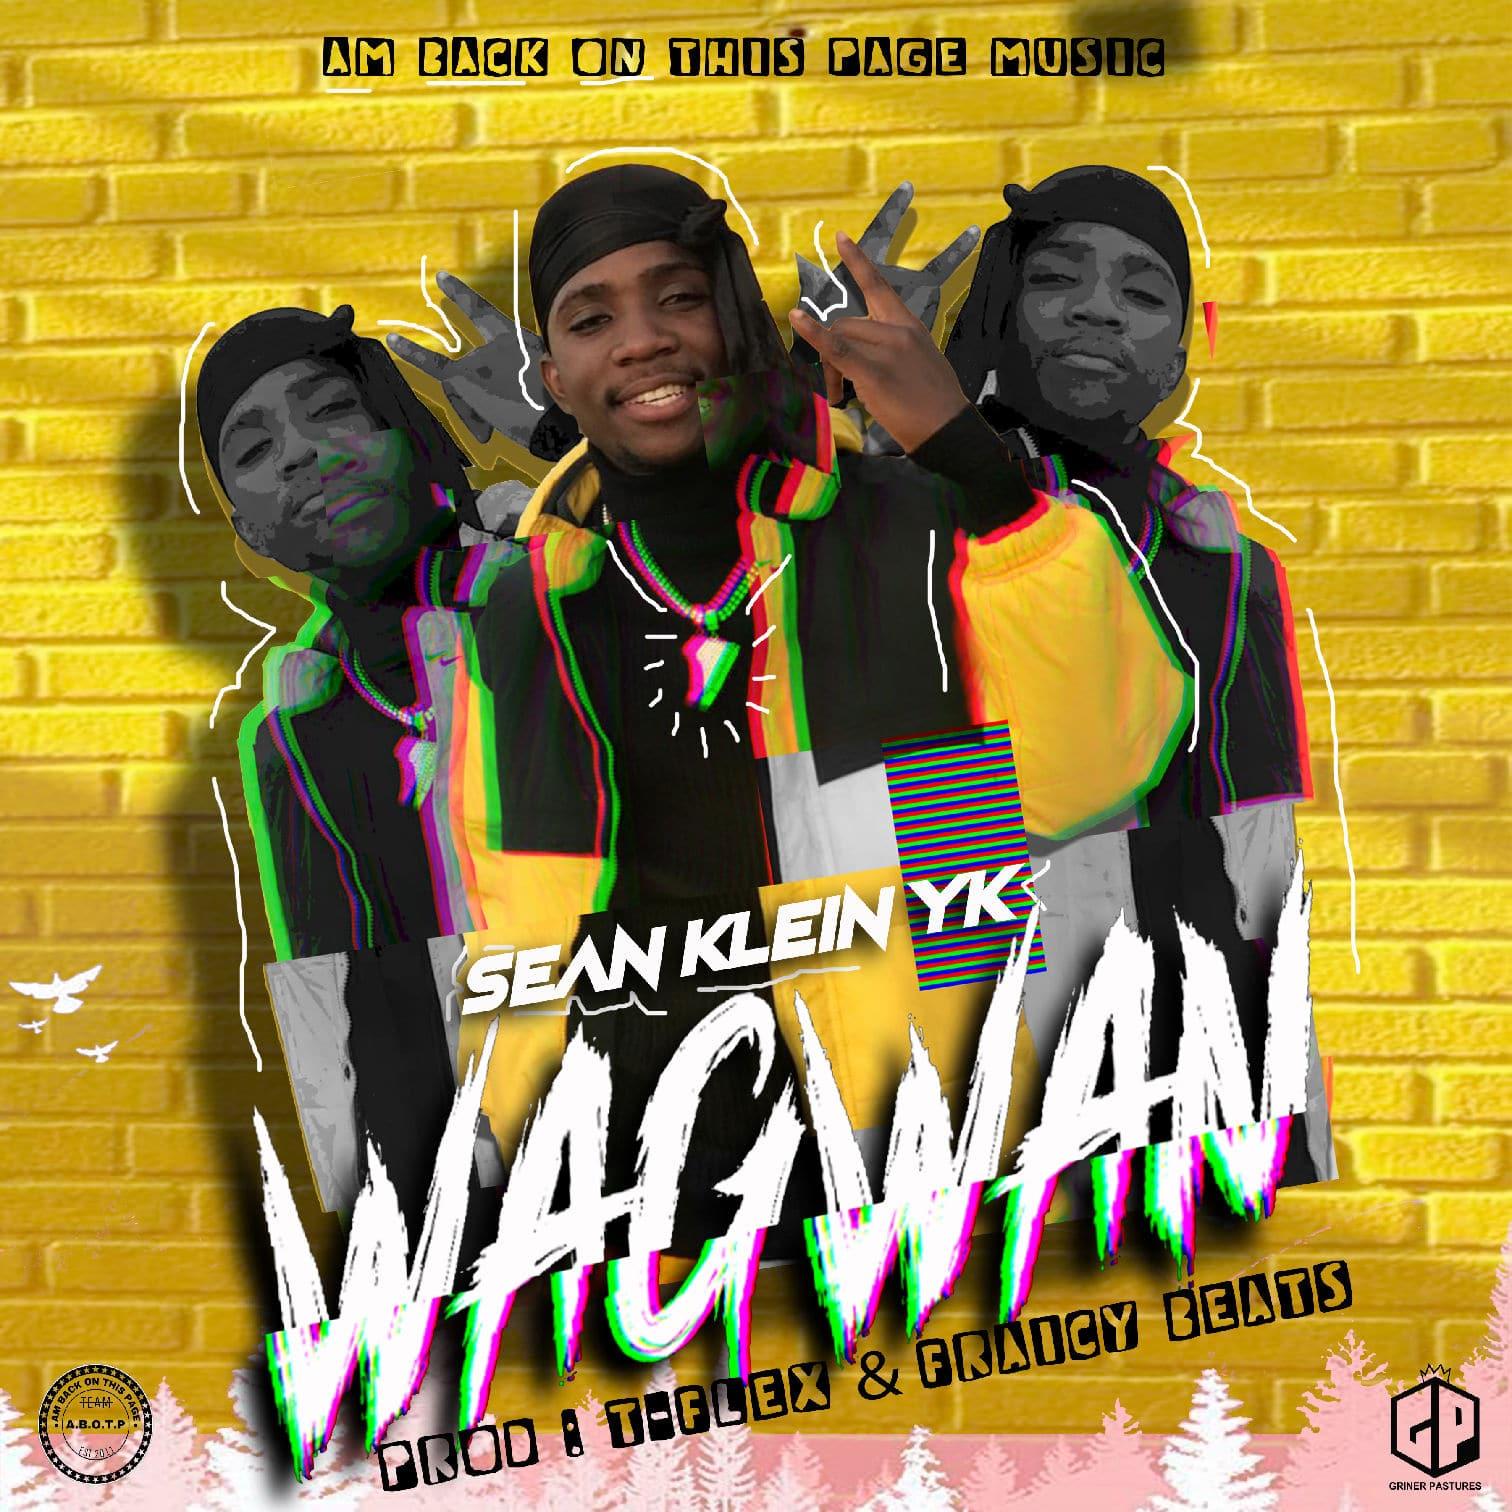 Sean Klein YK Wagwan